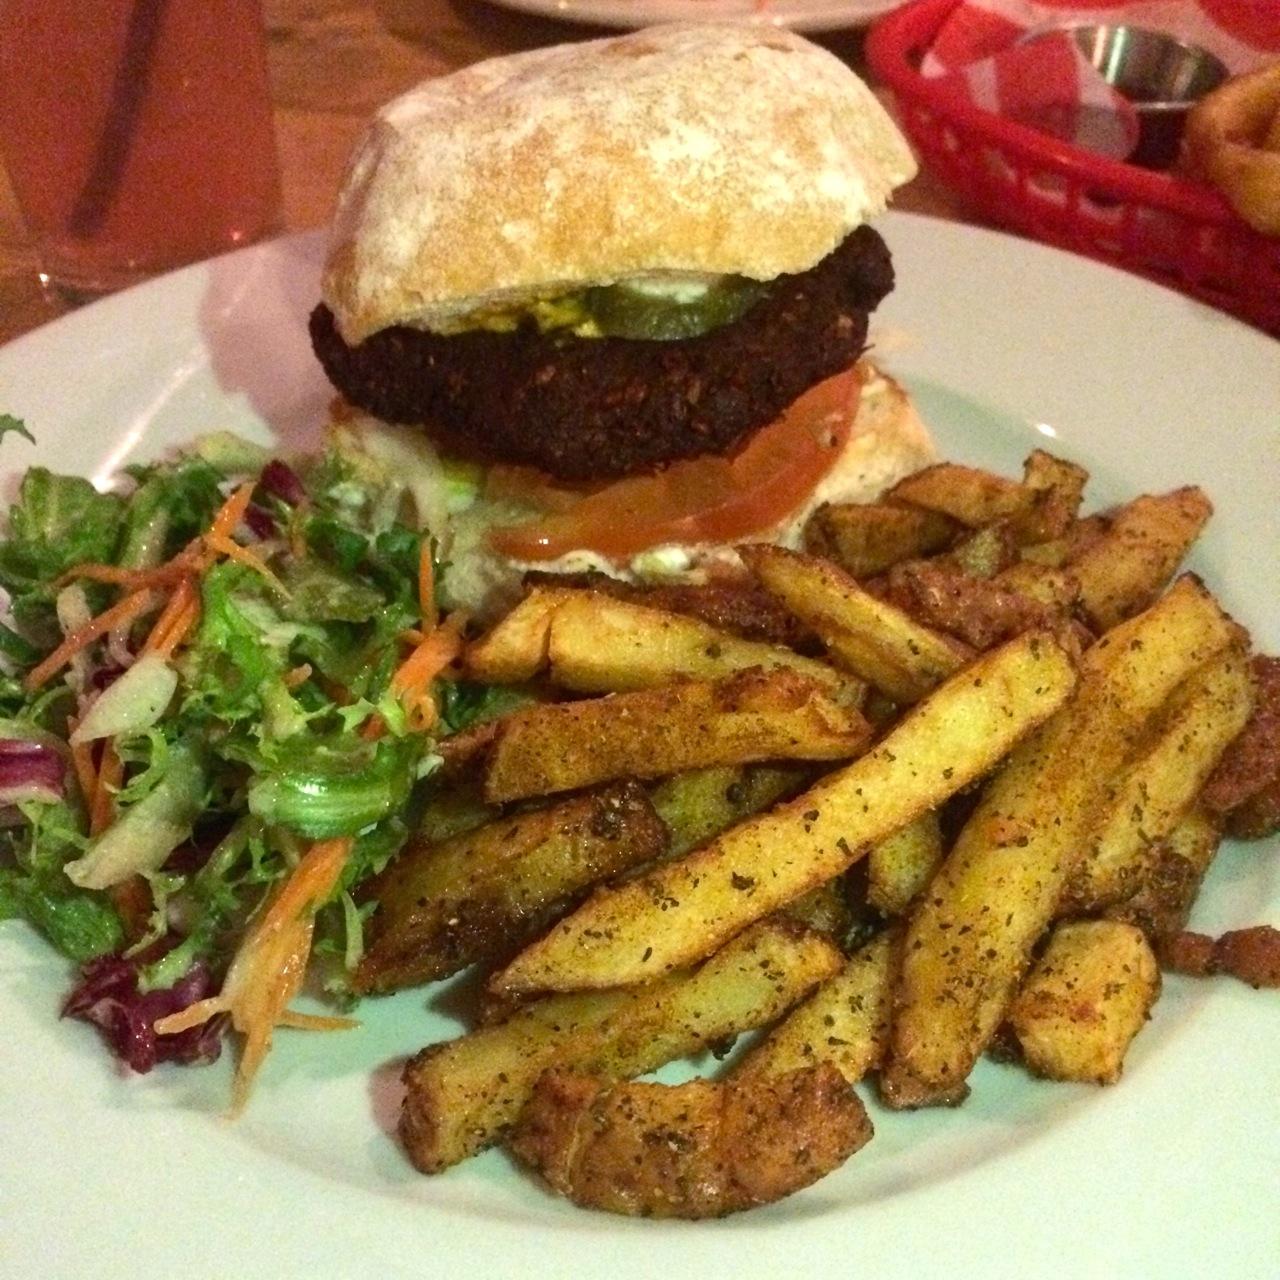 https://i1.wp.com/fatgayvegan.com/wp-content/uploads/2015/12/burger-and-chips.jpg?fit=1280%2C1280